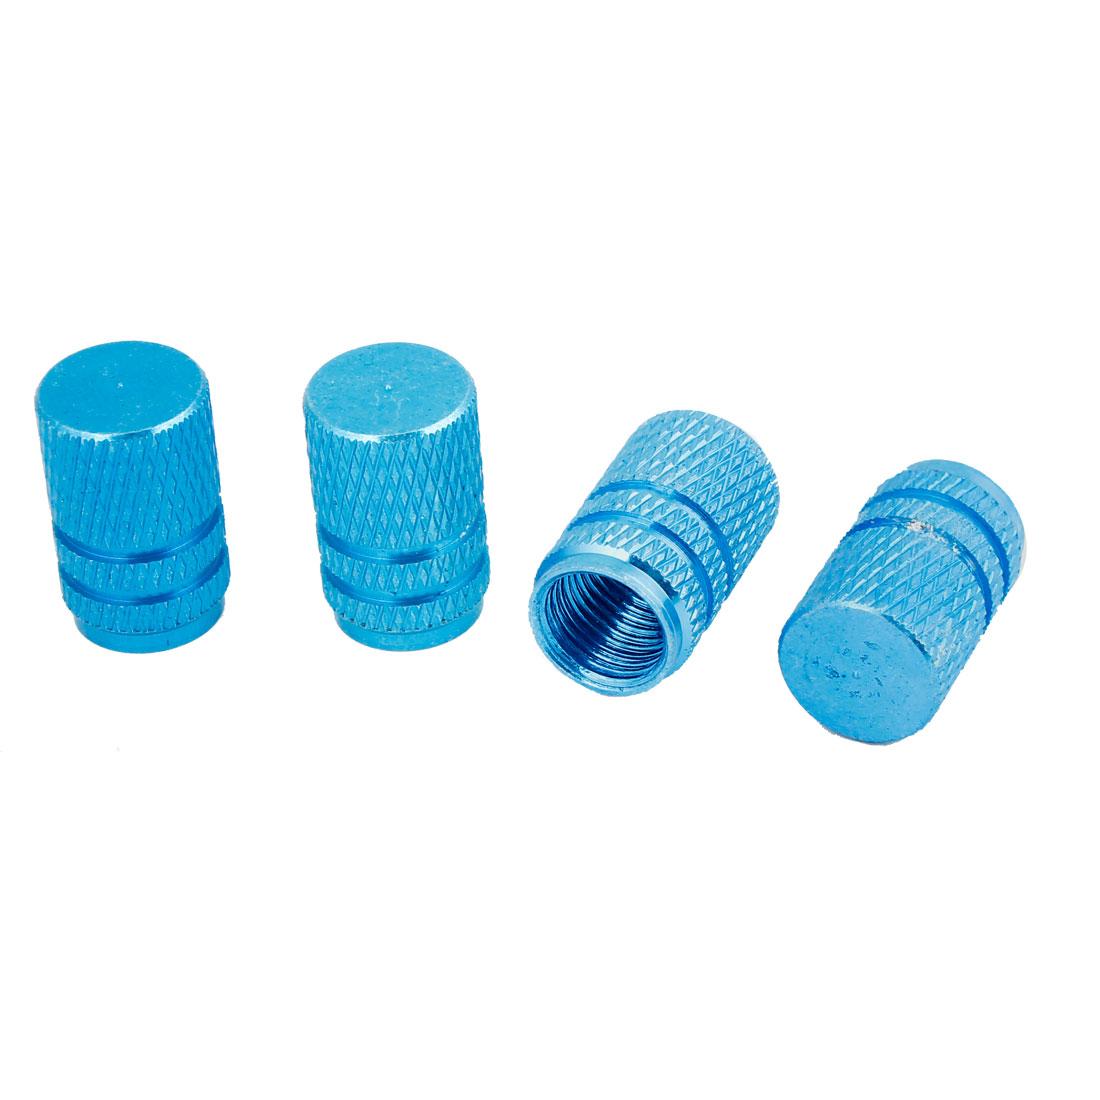 Cylinder Design Car Tire Rim Valve Air Dust Cover Stems Protector Blue 4 Pcs